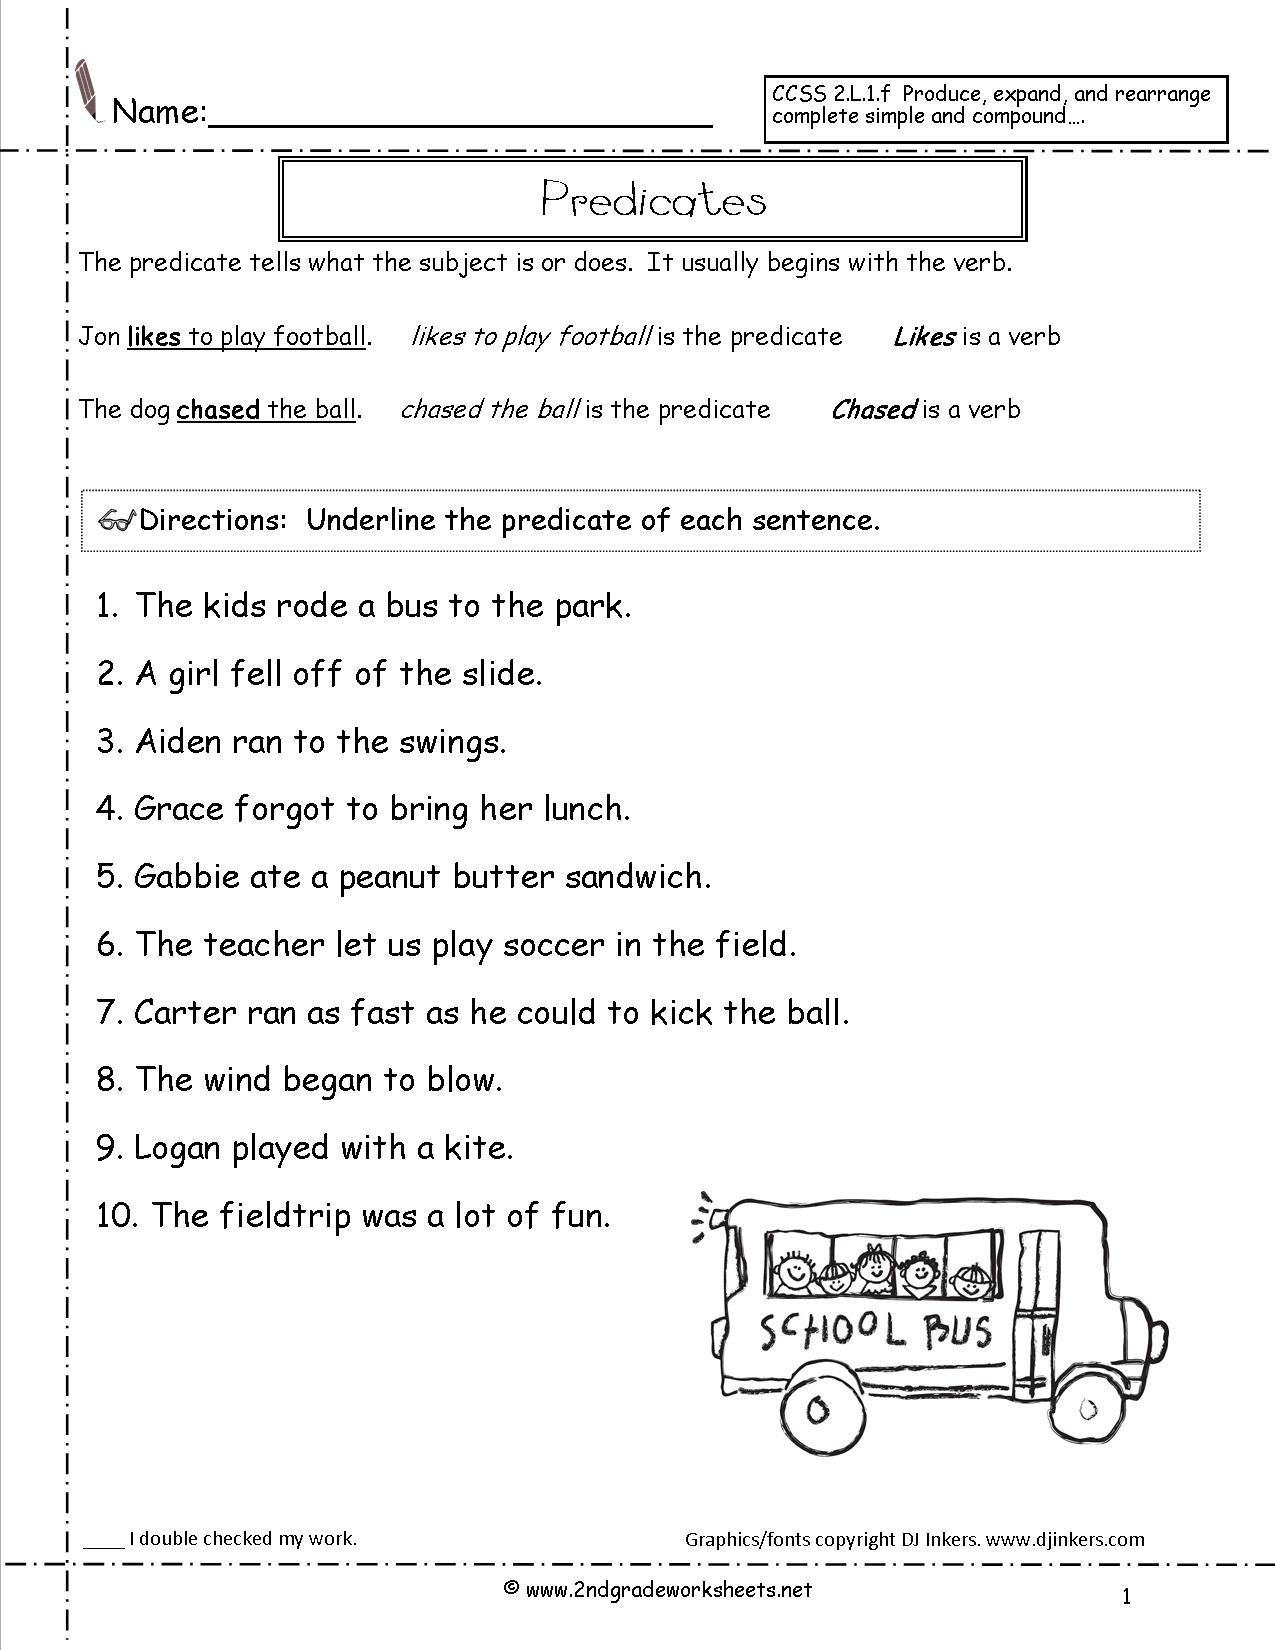 Sentence Correction Worksheets 2Nd Grade To Download Free - Math - Free Printable Sentence Correction Worksheets